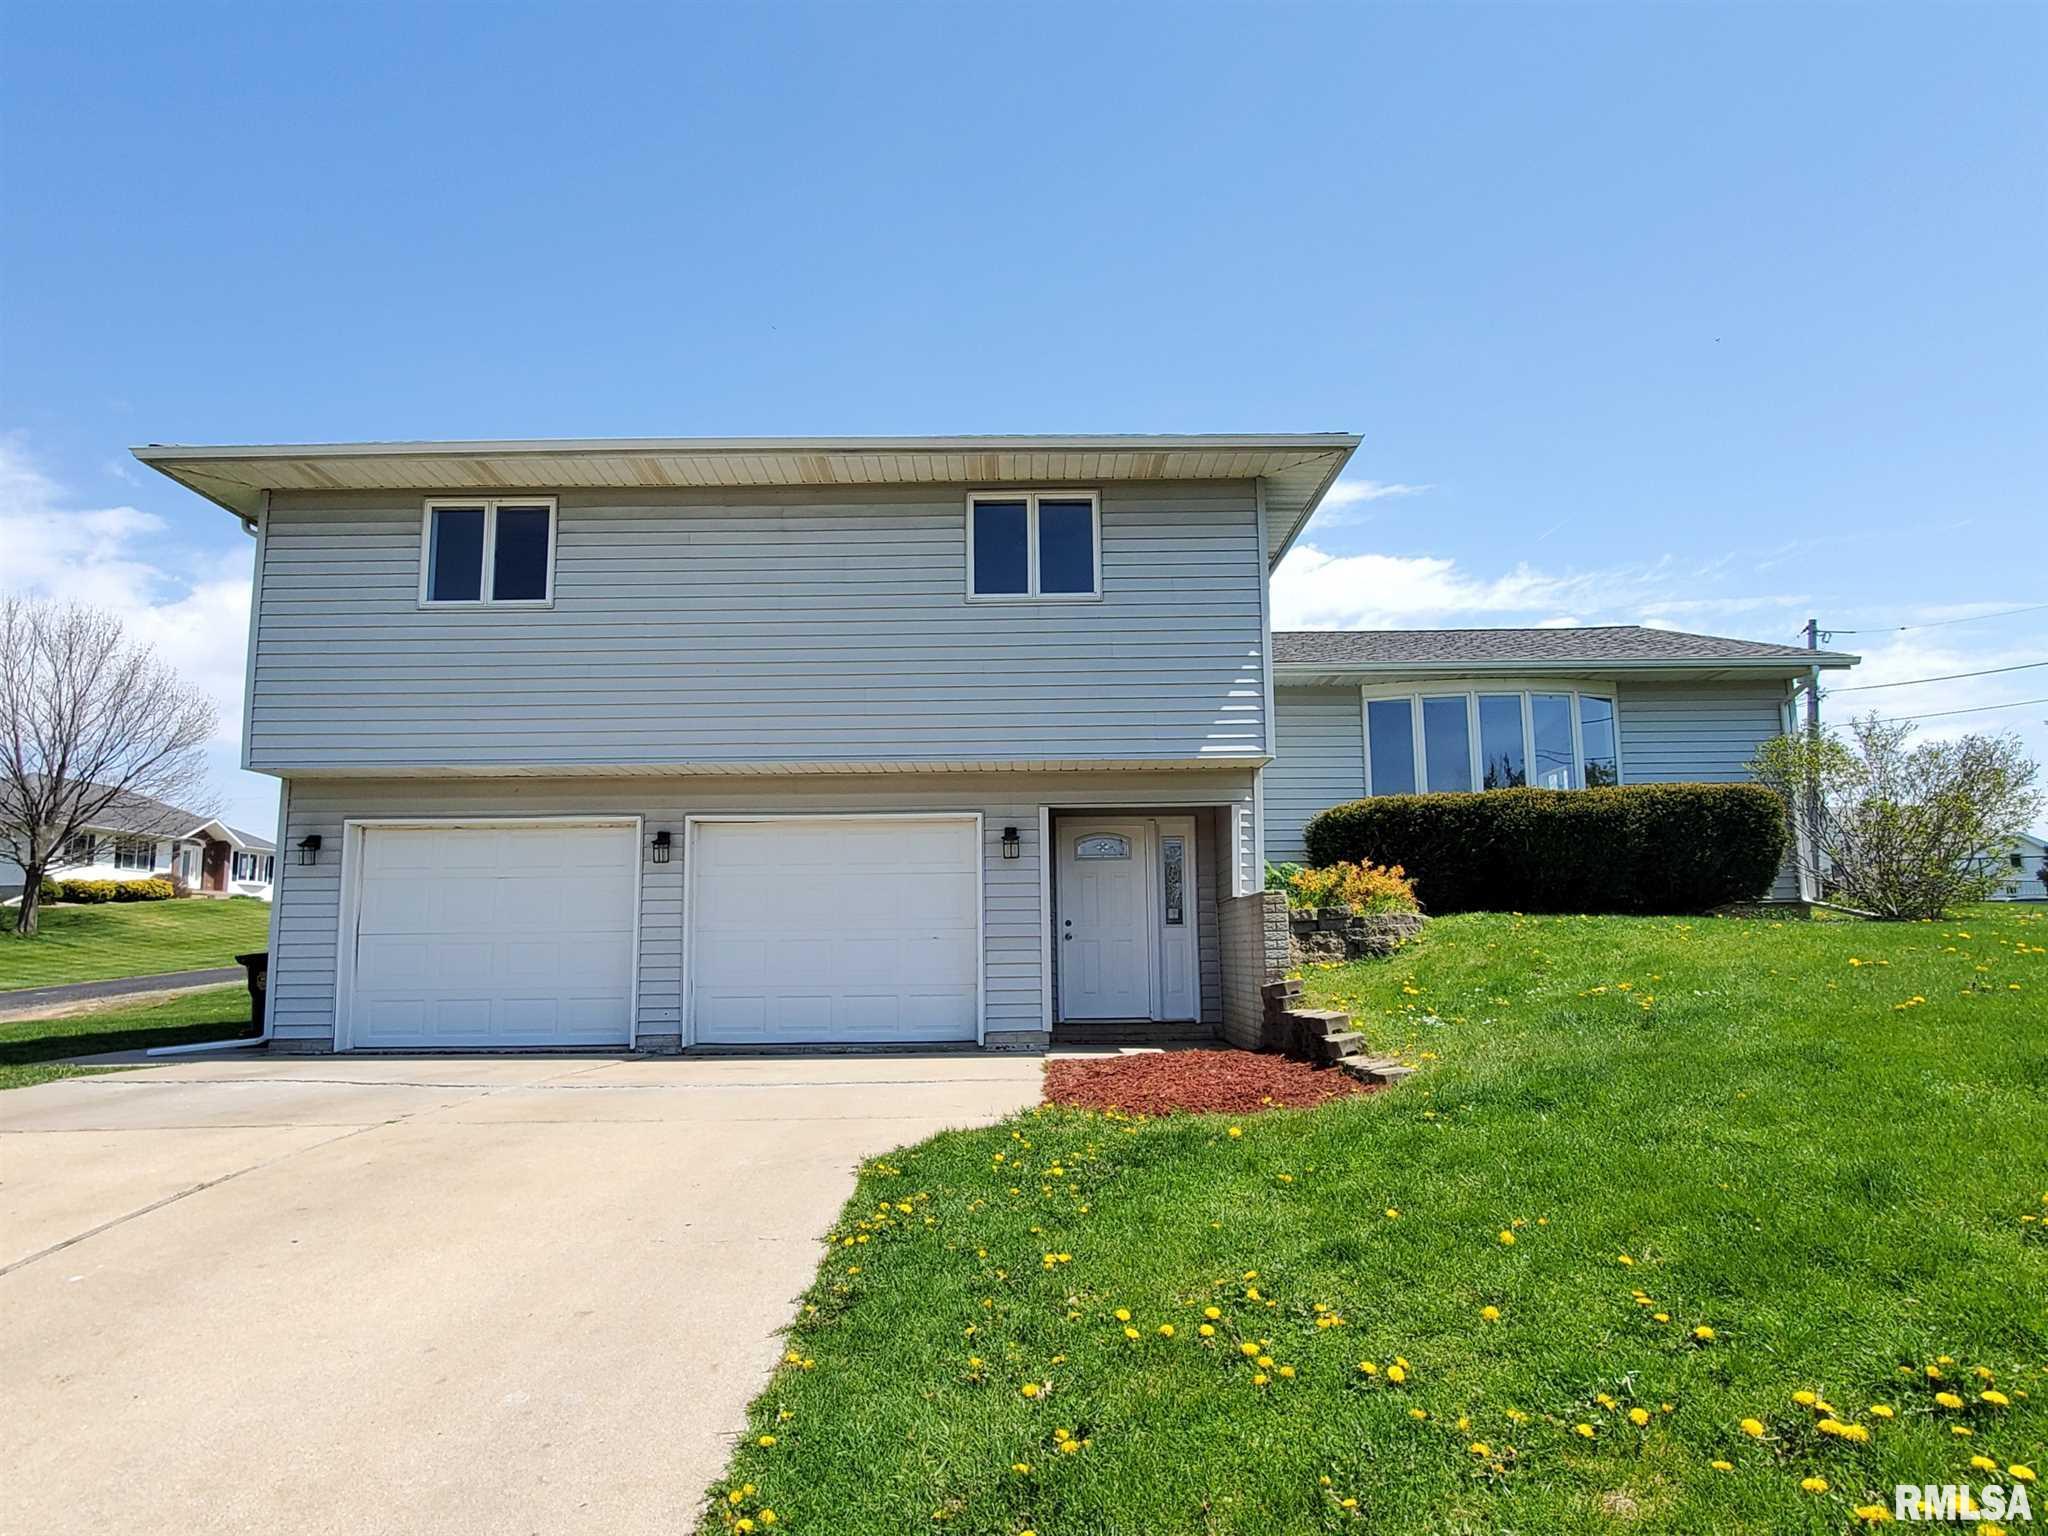 201 7TH Property Photo - Fulton, IL real estate listing